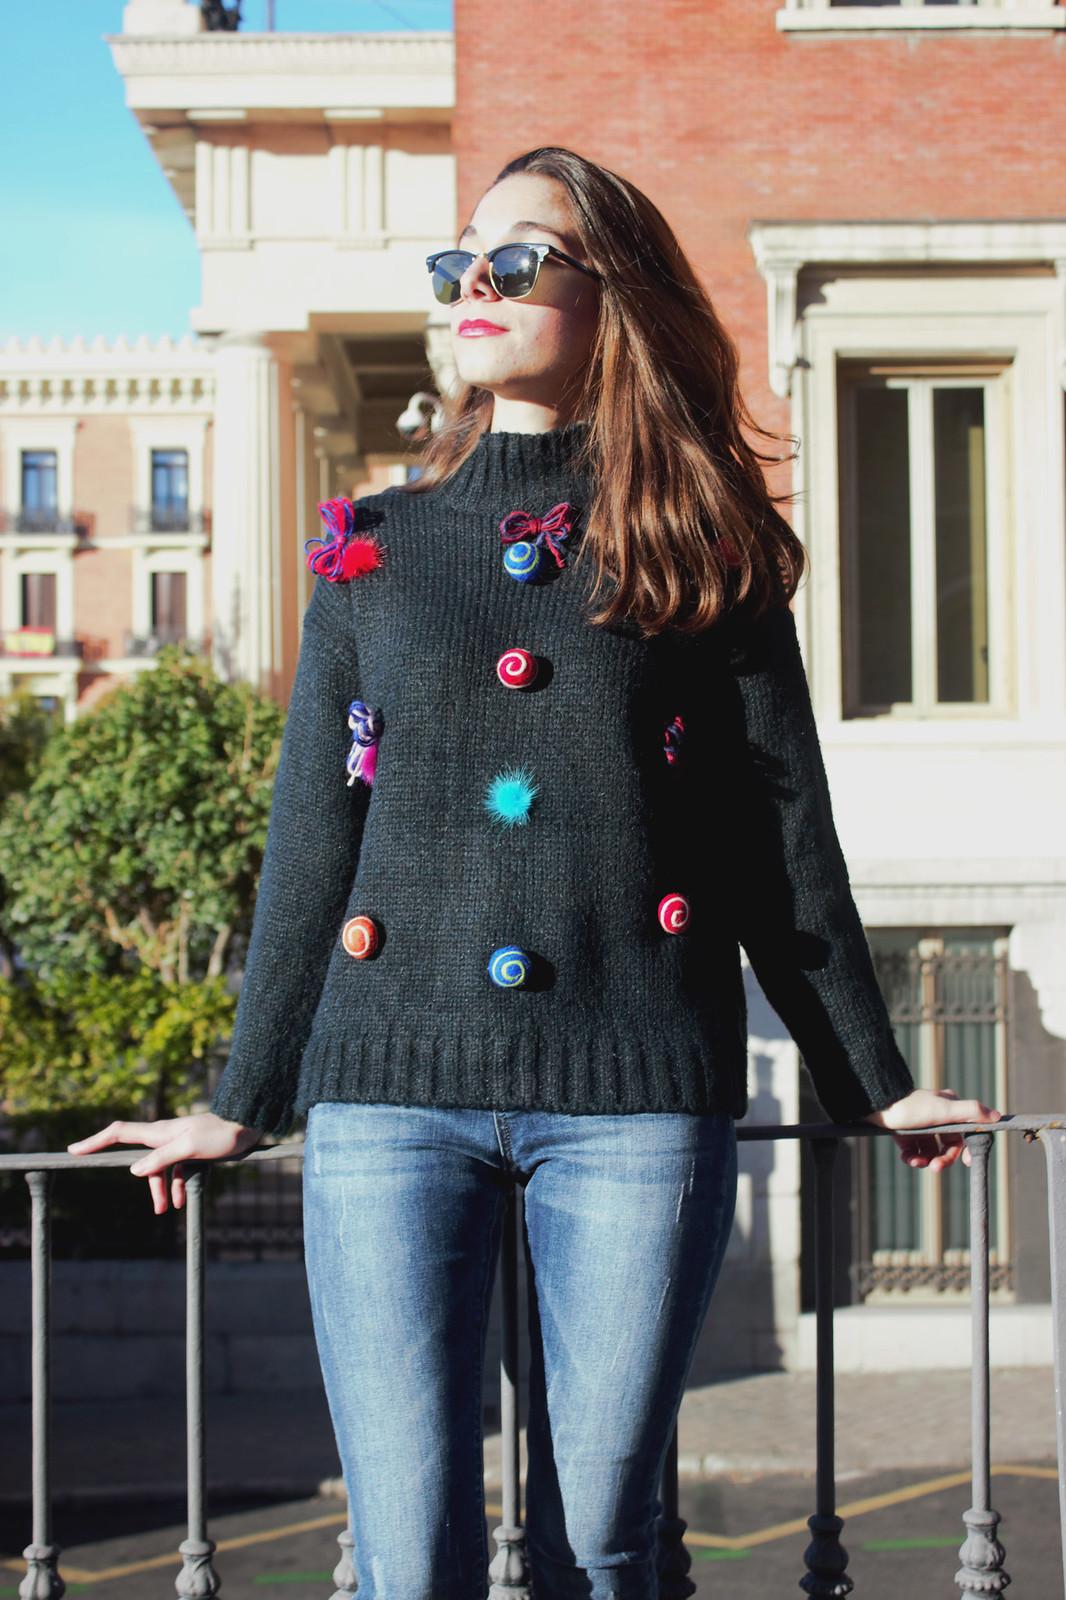 madlula-fashion-style-streetstyle-jersey-alegría-azul-detalles-lazos-pompones-2017-otoño-invierno